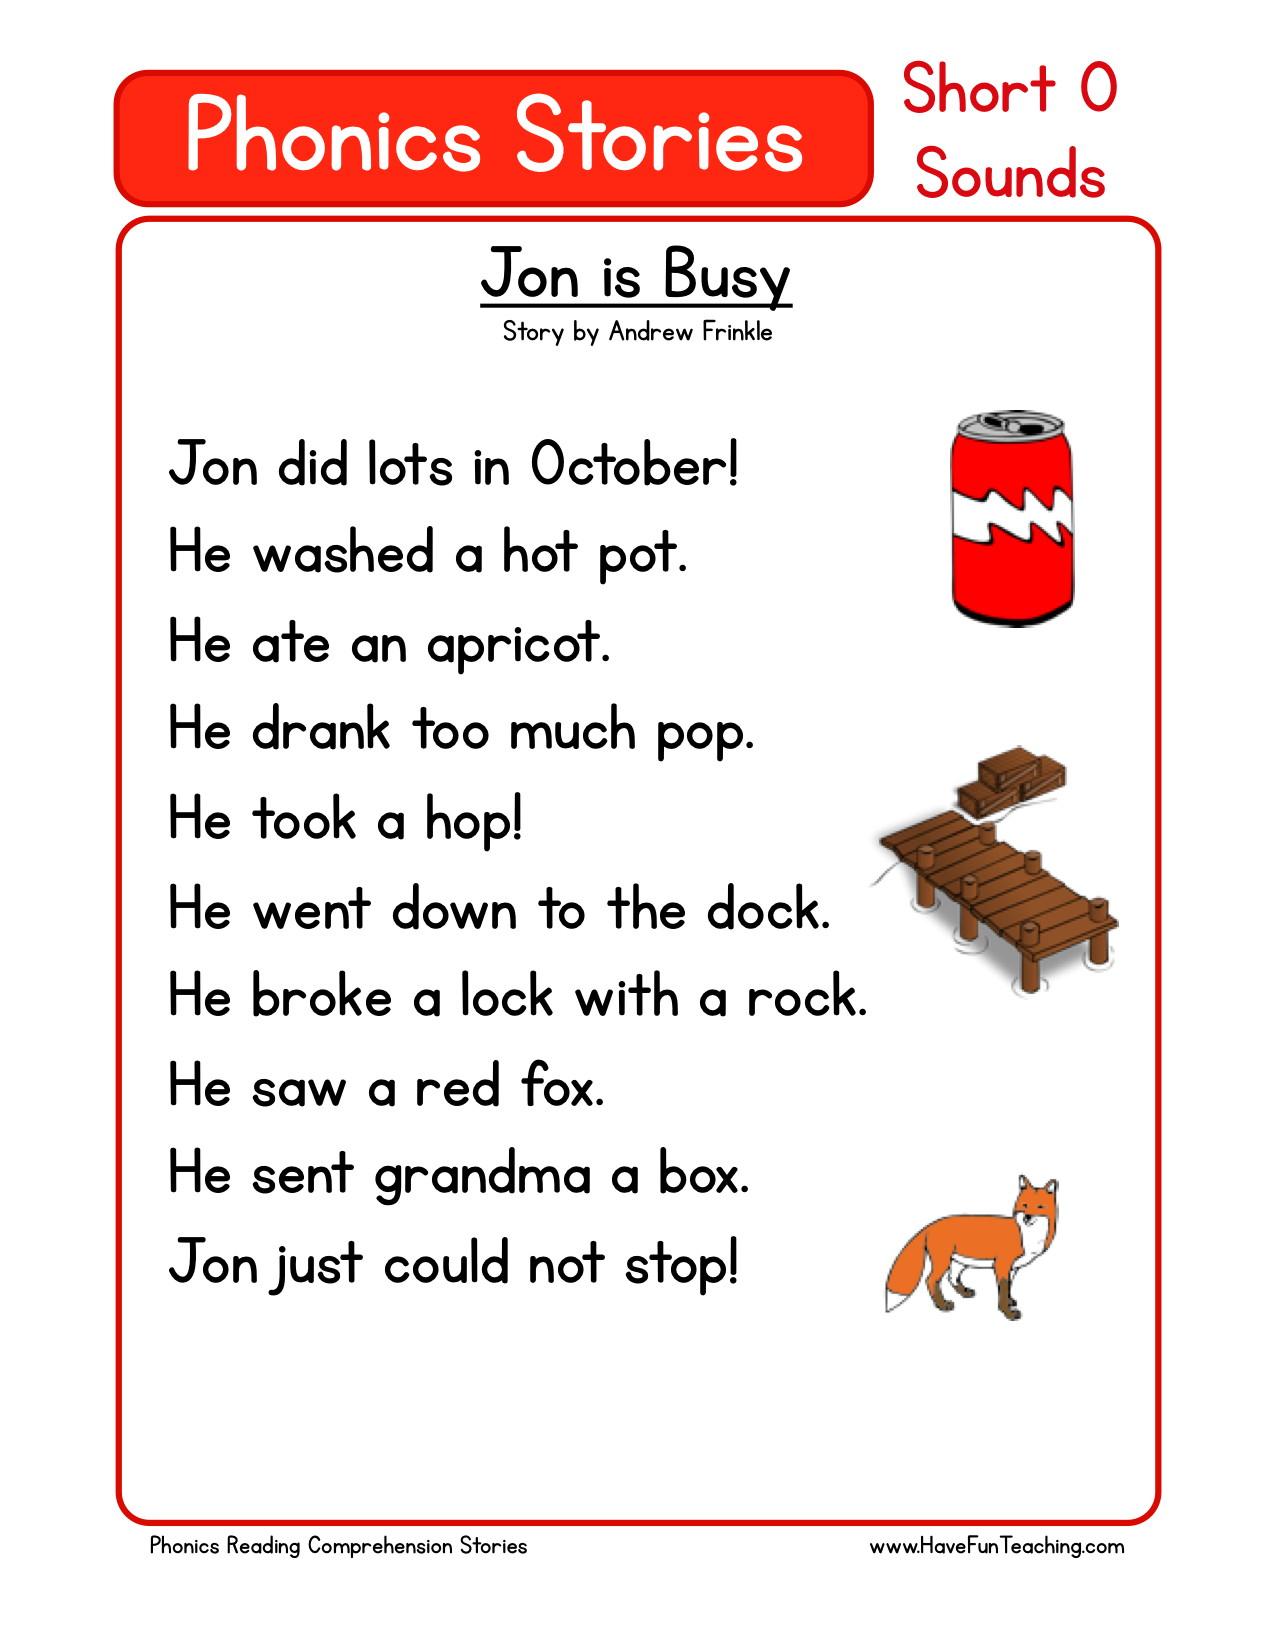 Reading Comprehension Worksheet - Jon Is Busy - Free Phonics Readers Printable